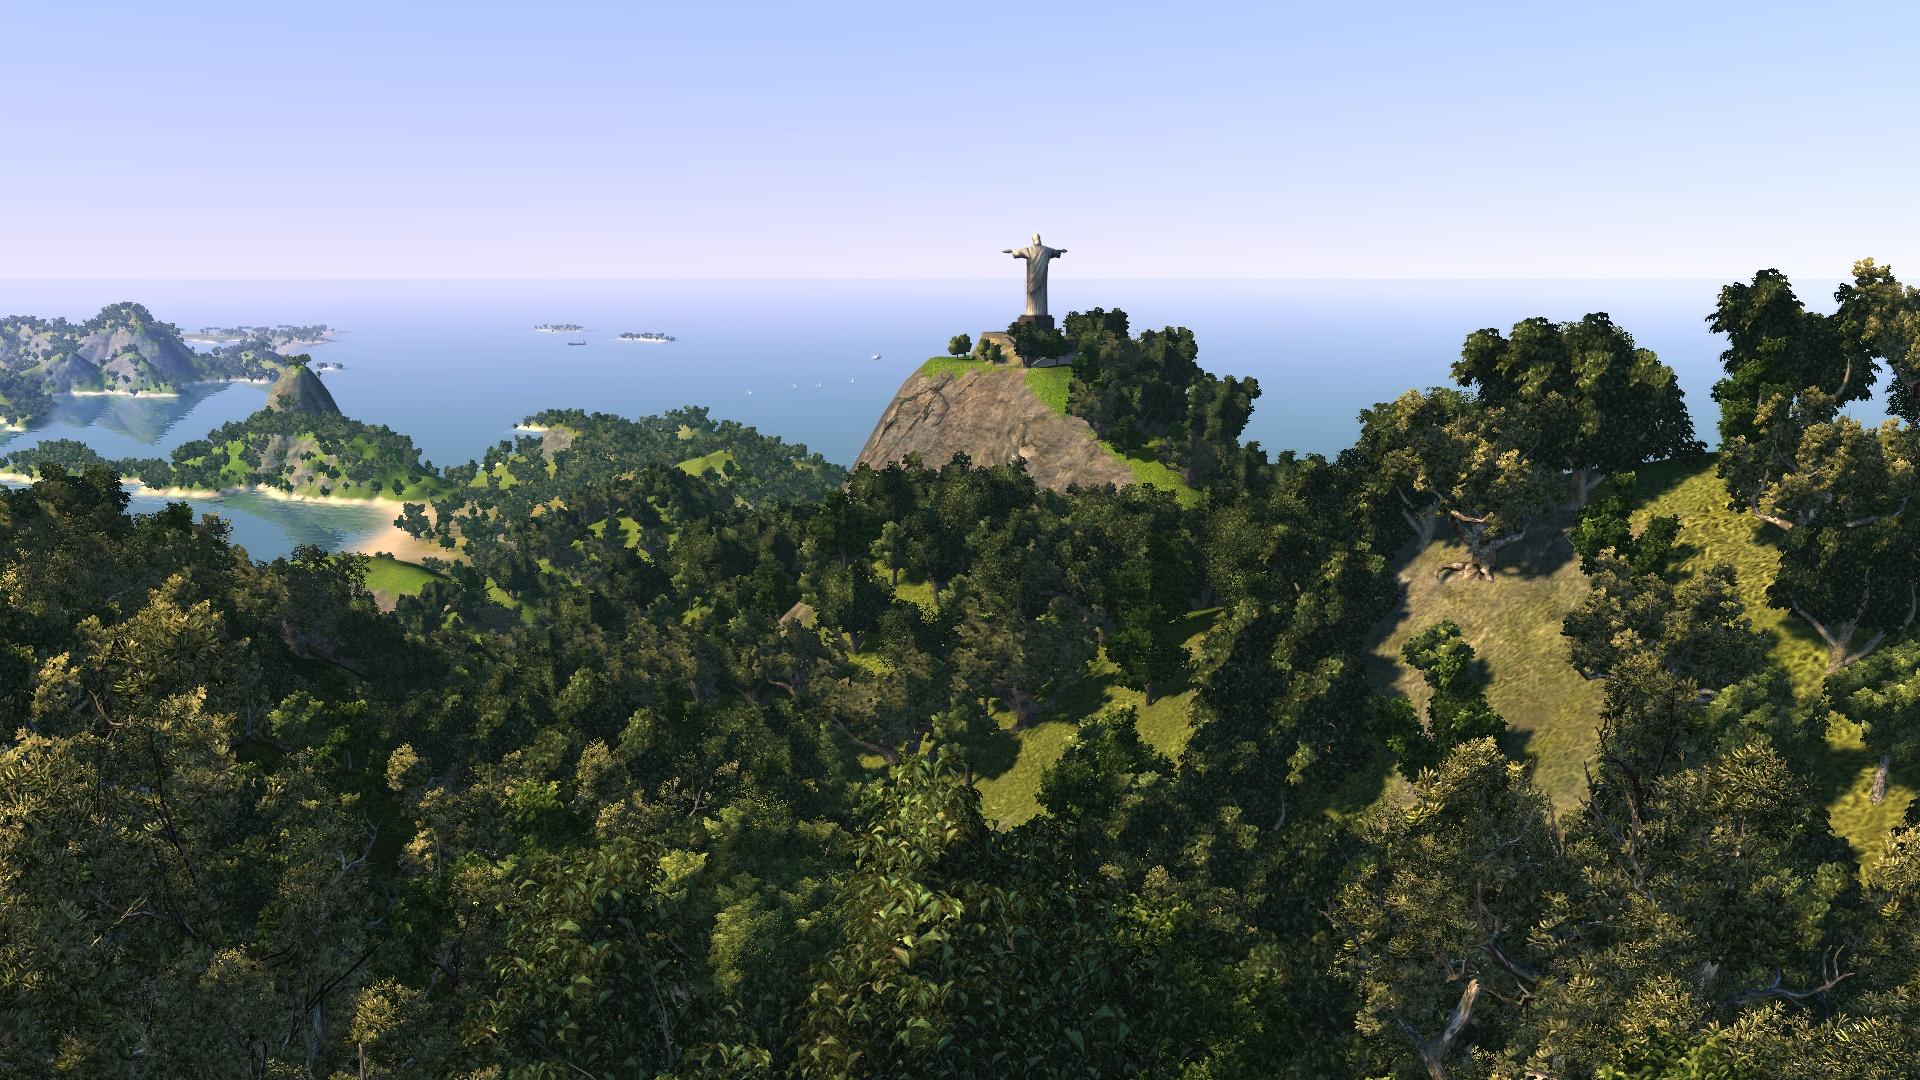 Rio De Janeiro Cities XL Wiki FANDOM Powered By Wikia - New york map cities xl